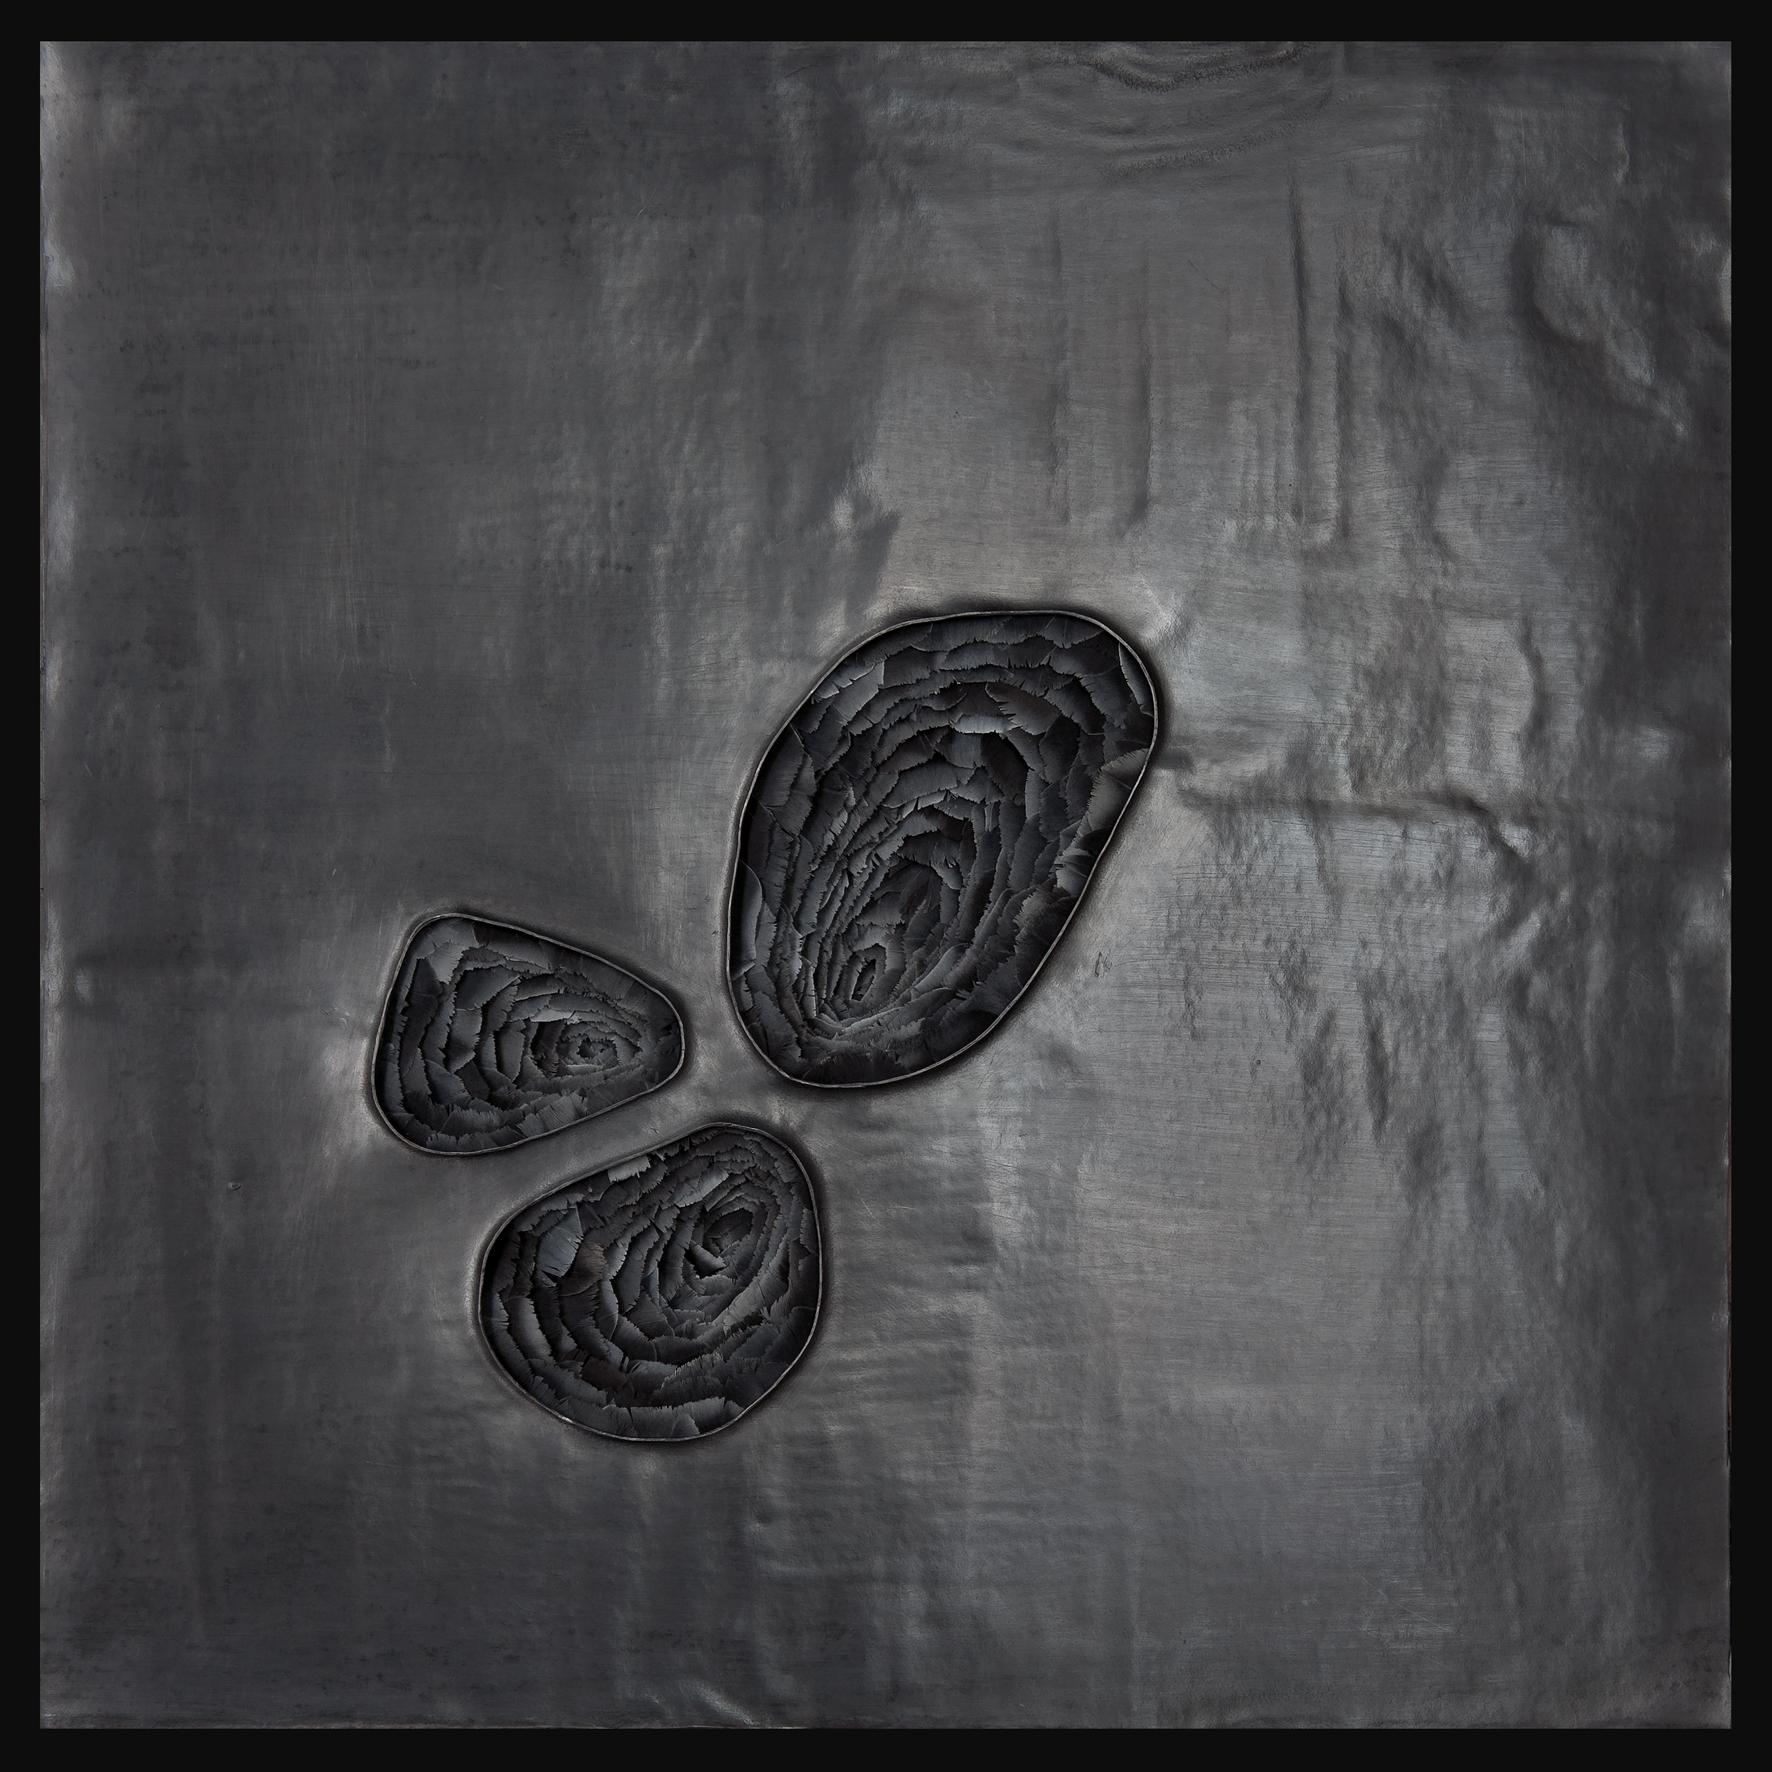 Stigma V, 2011, Kate MccGwire